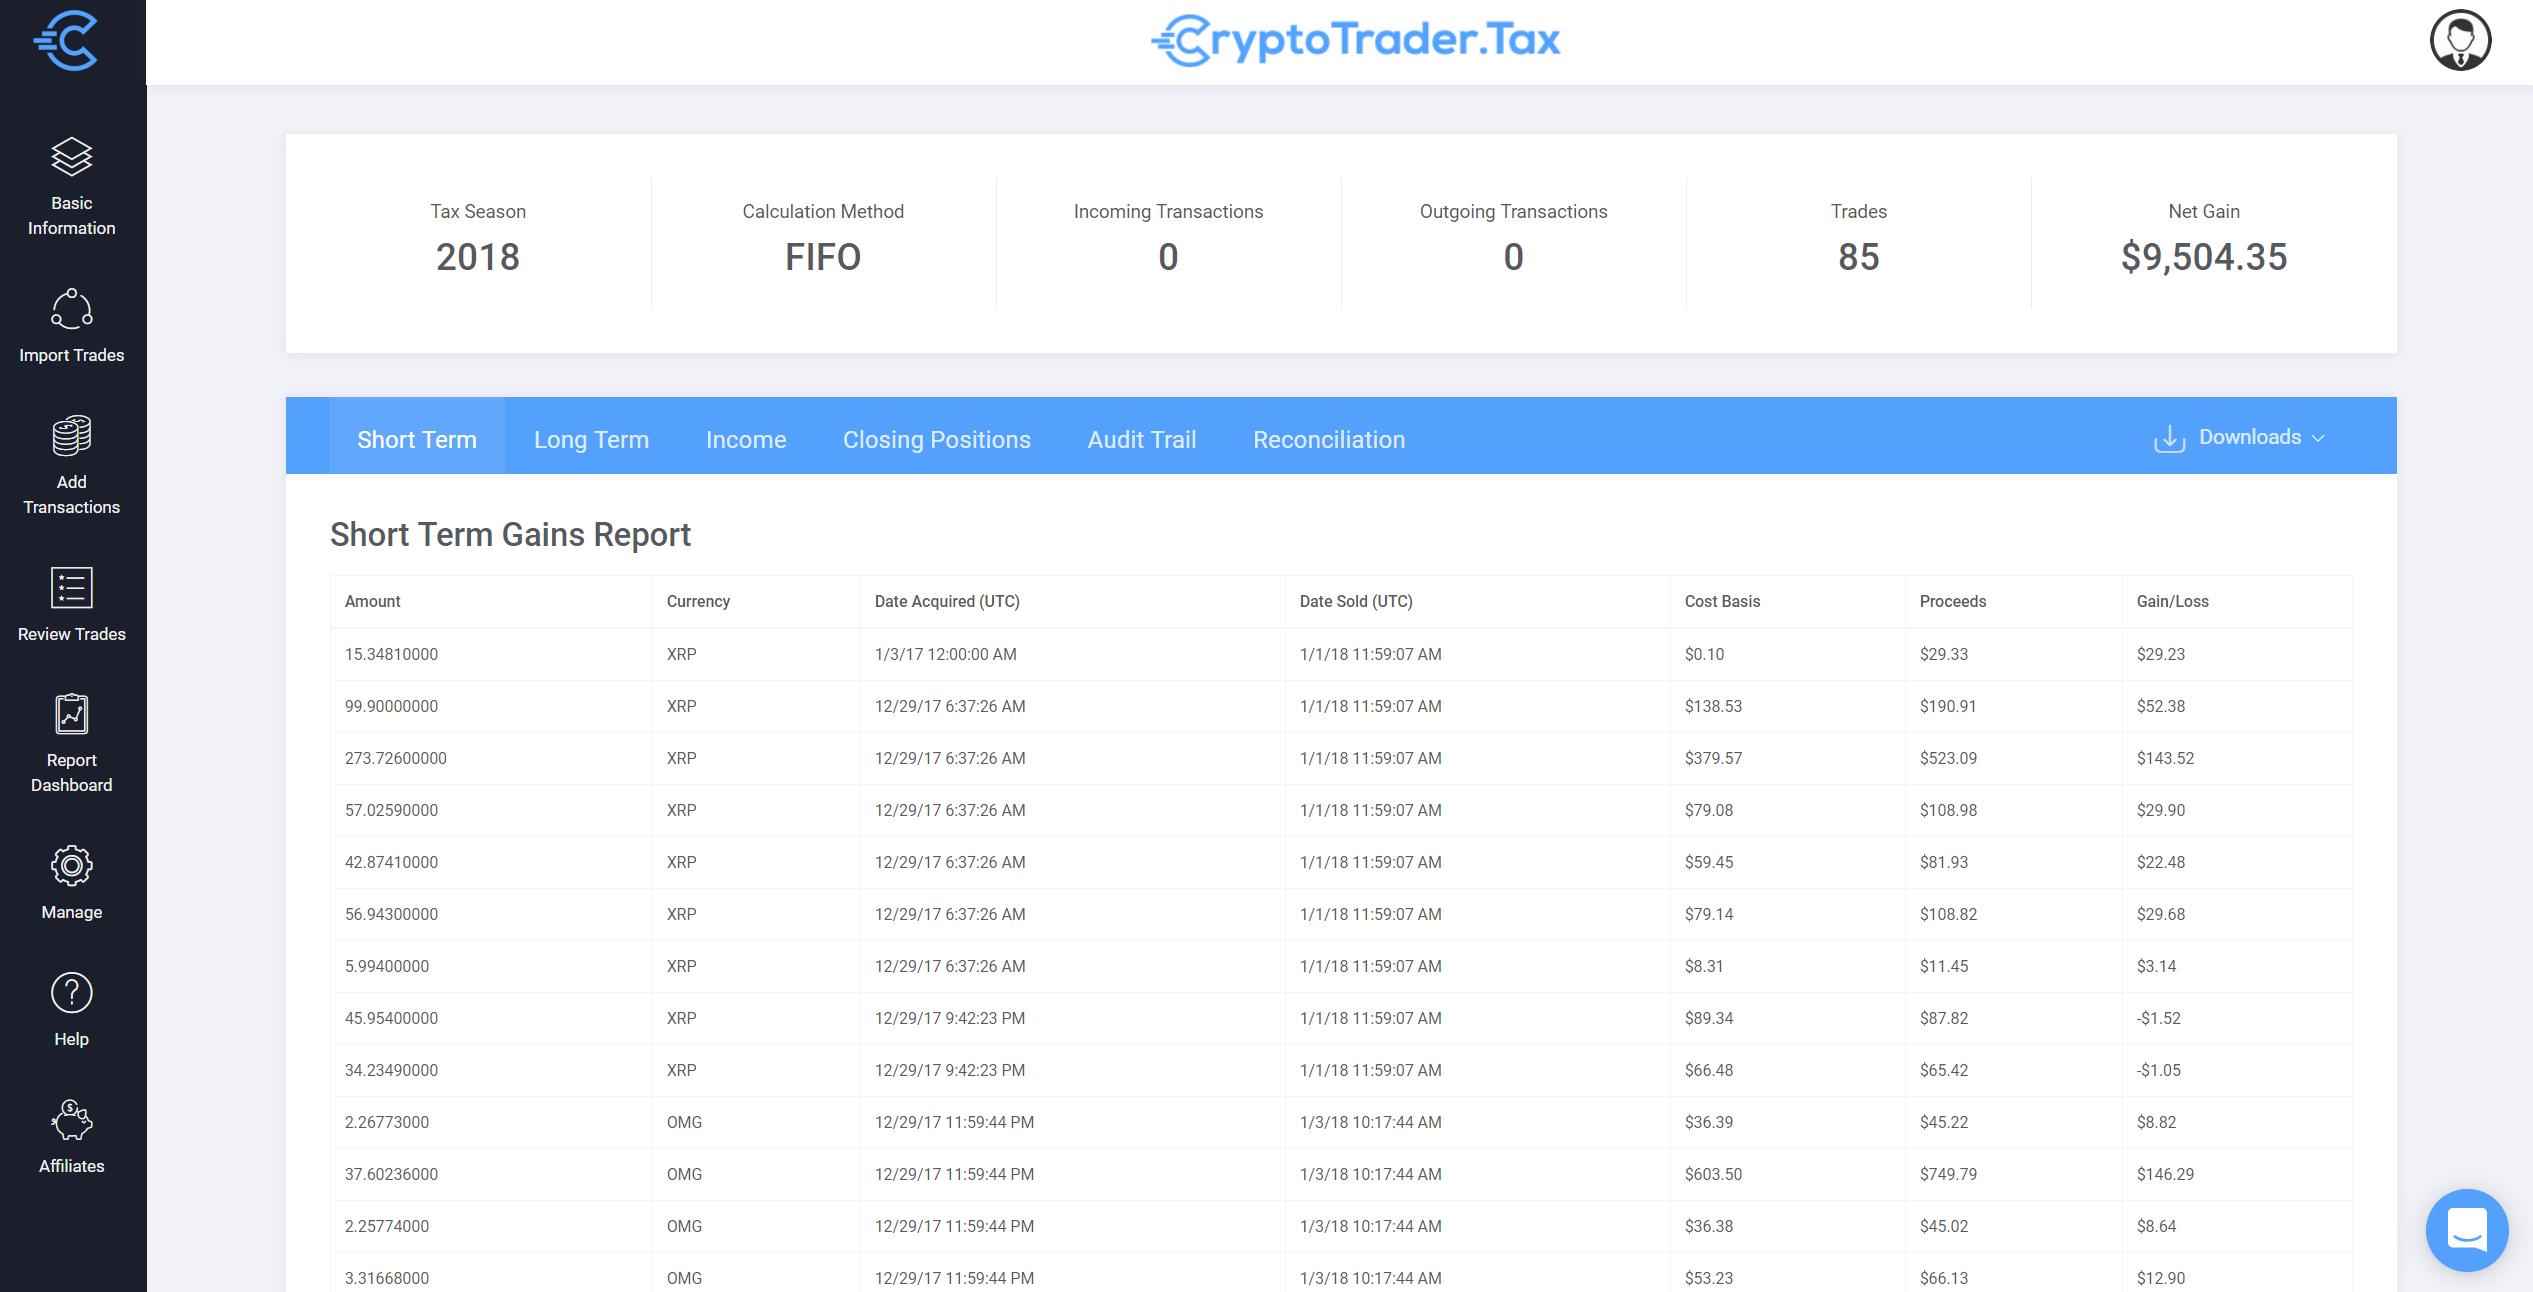 Bitcoin Tax Report Downloads